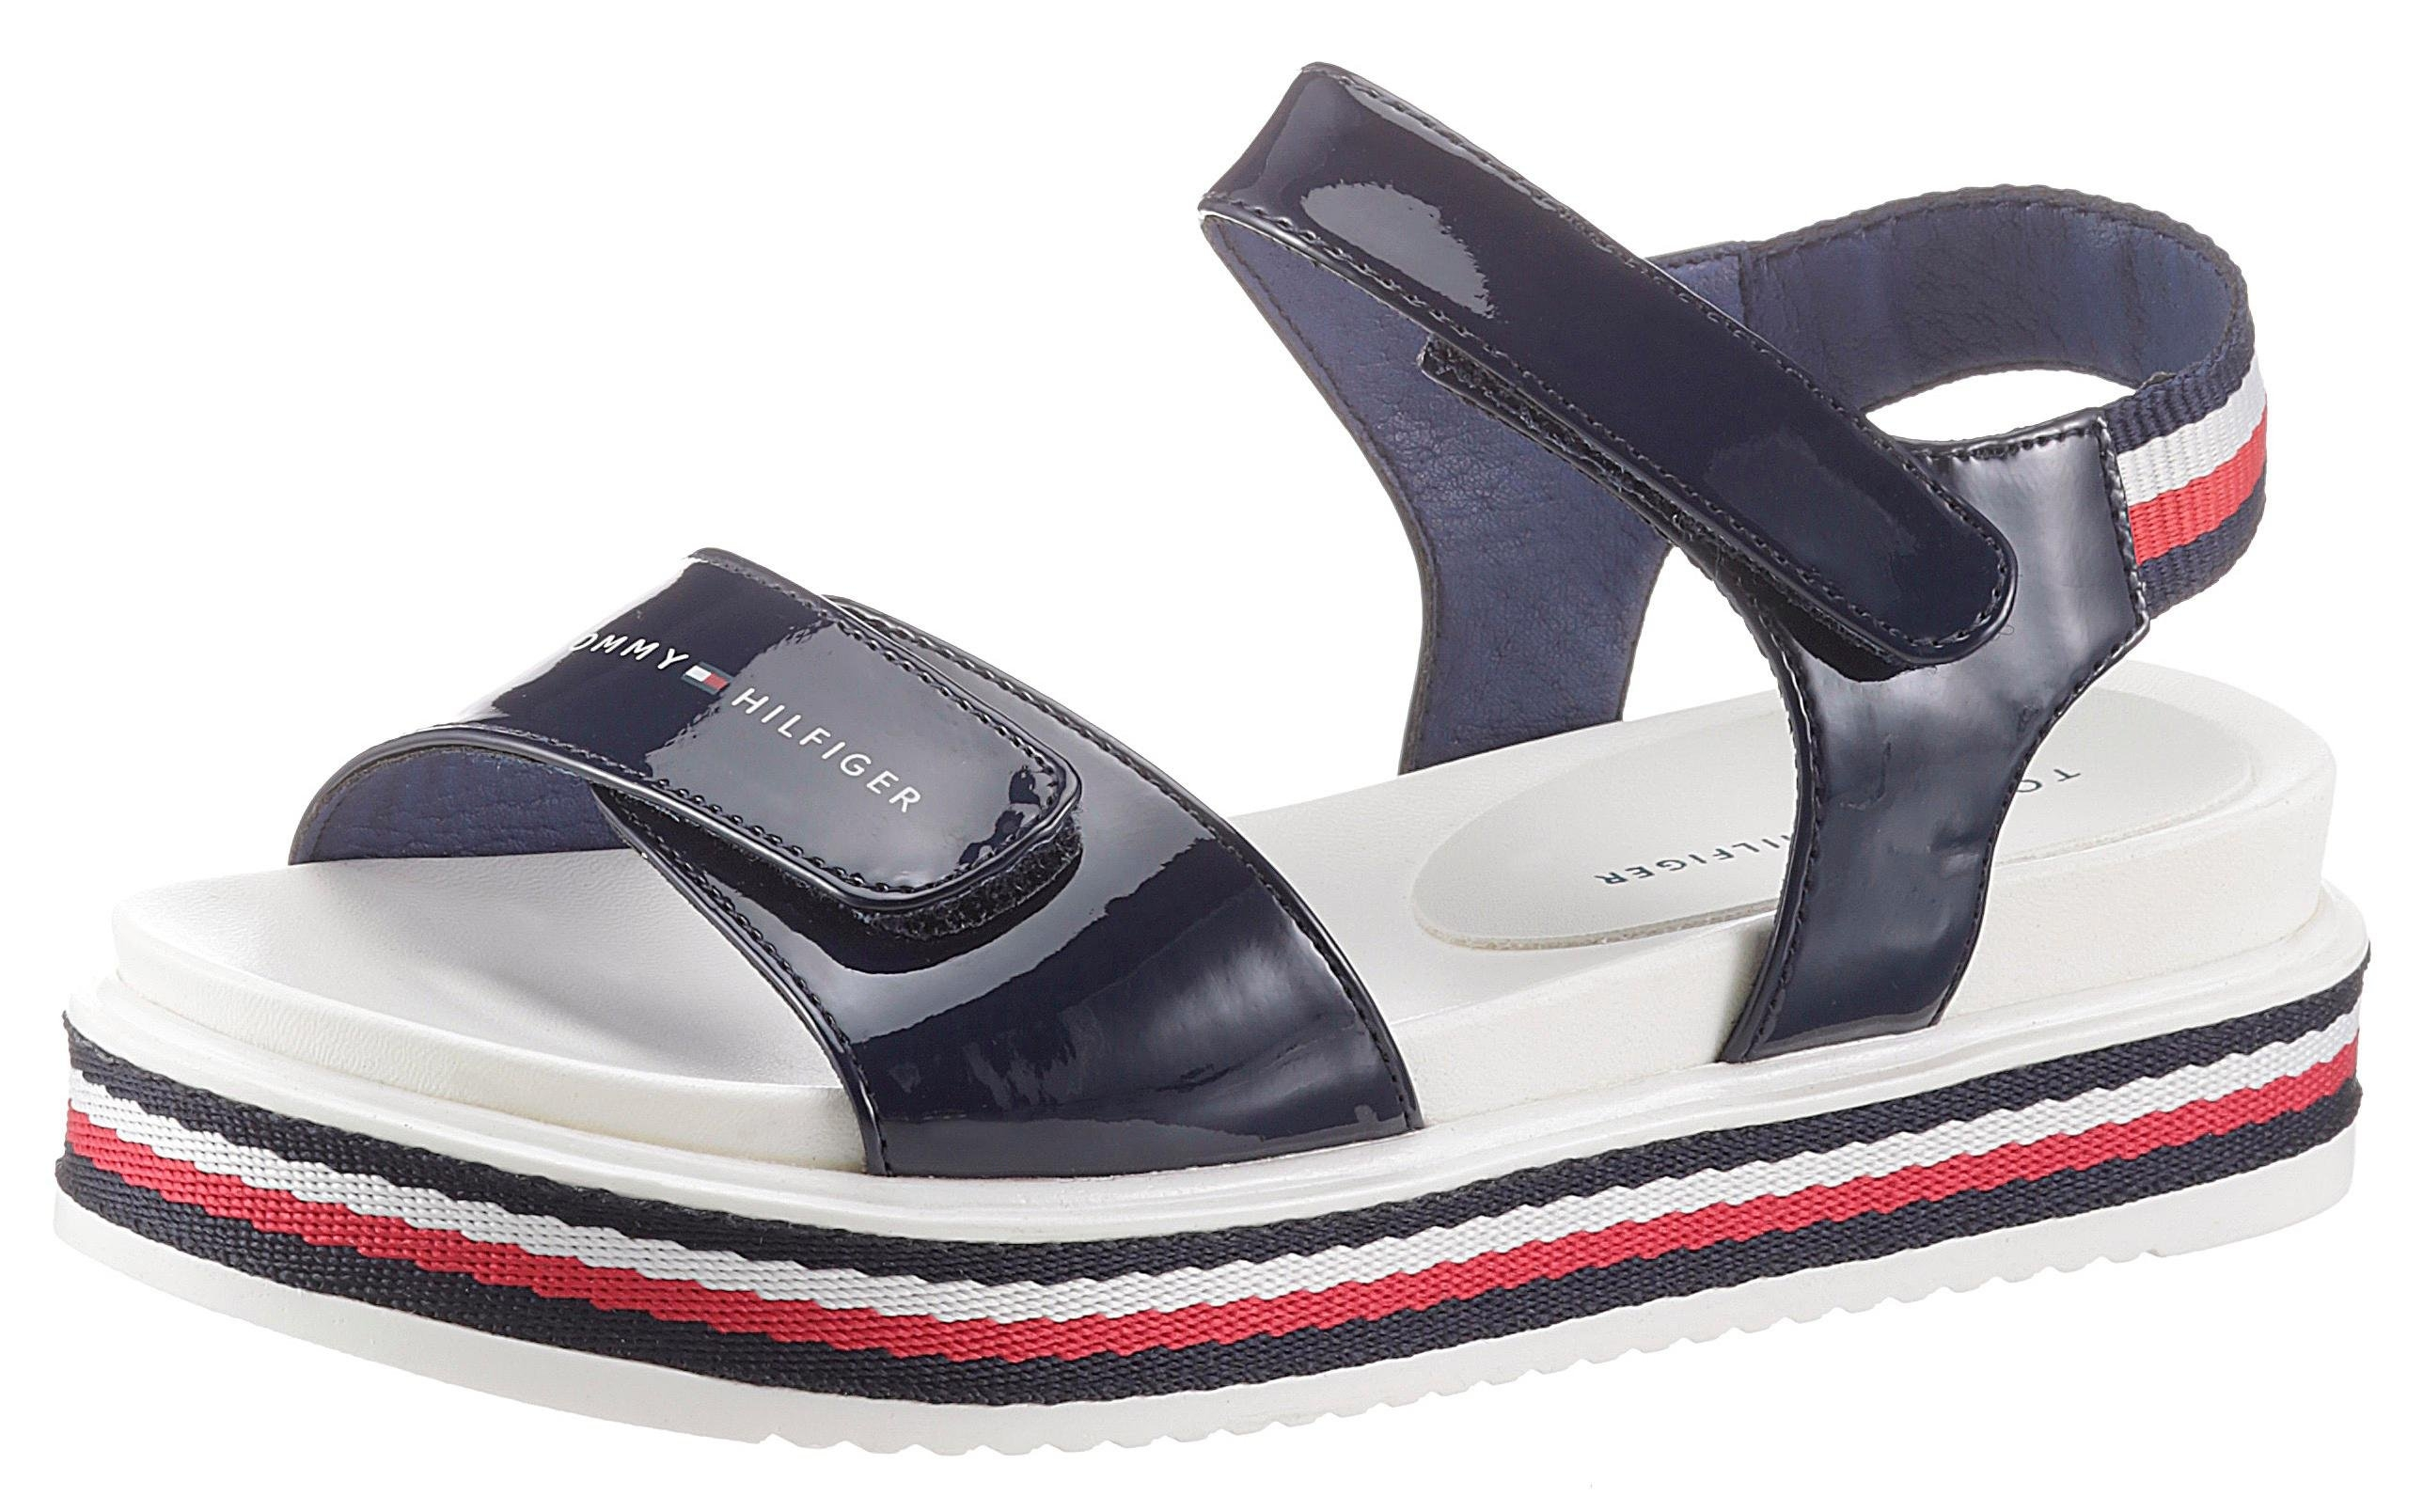 TOMMY HILFIGER sandalen goedkoop op otto.nl kopen